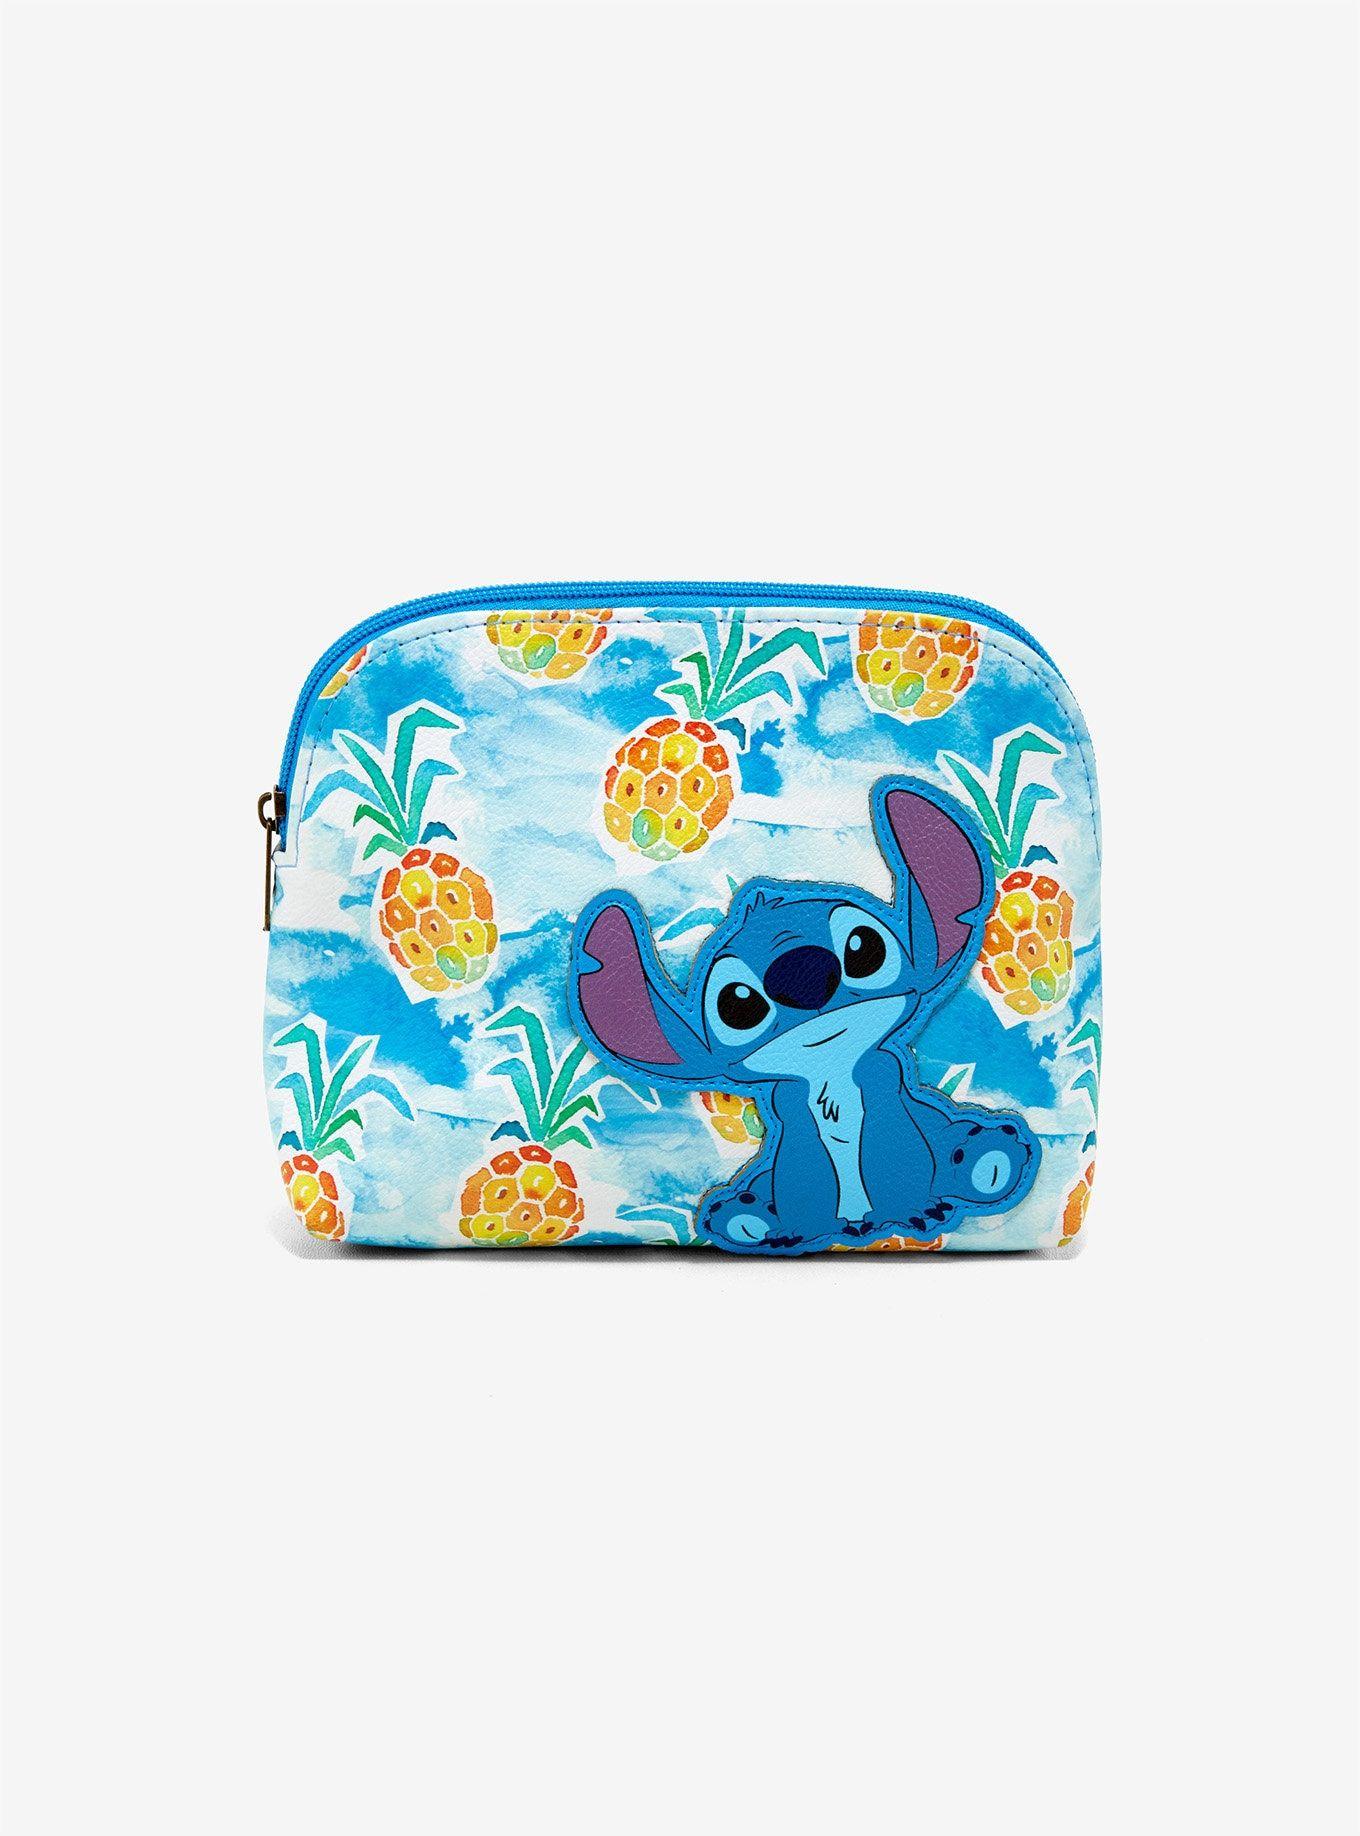 Loungefly Disney Lilo & Stitch Pineapples Makeup Bag